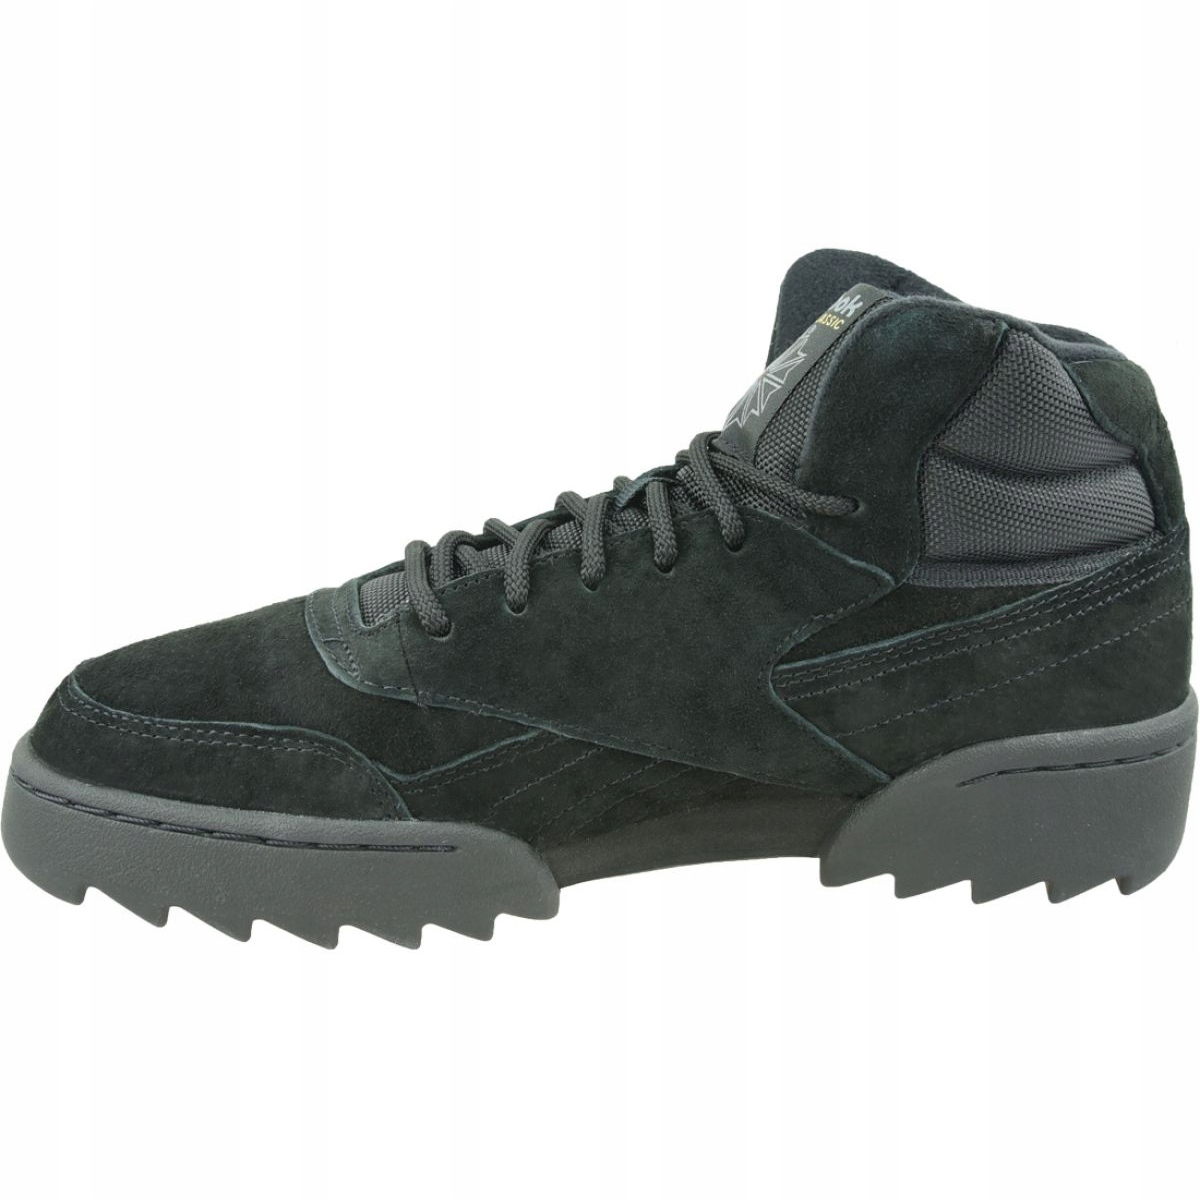 Details about  /Reebok Exofit Hi Plus rippleboot Mens Shoes Hiking Boots Shoes Black FU9124 show original title